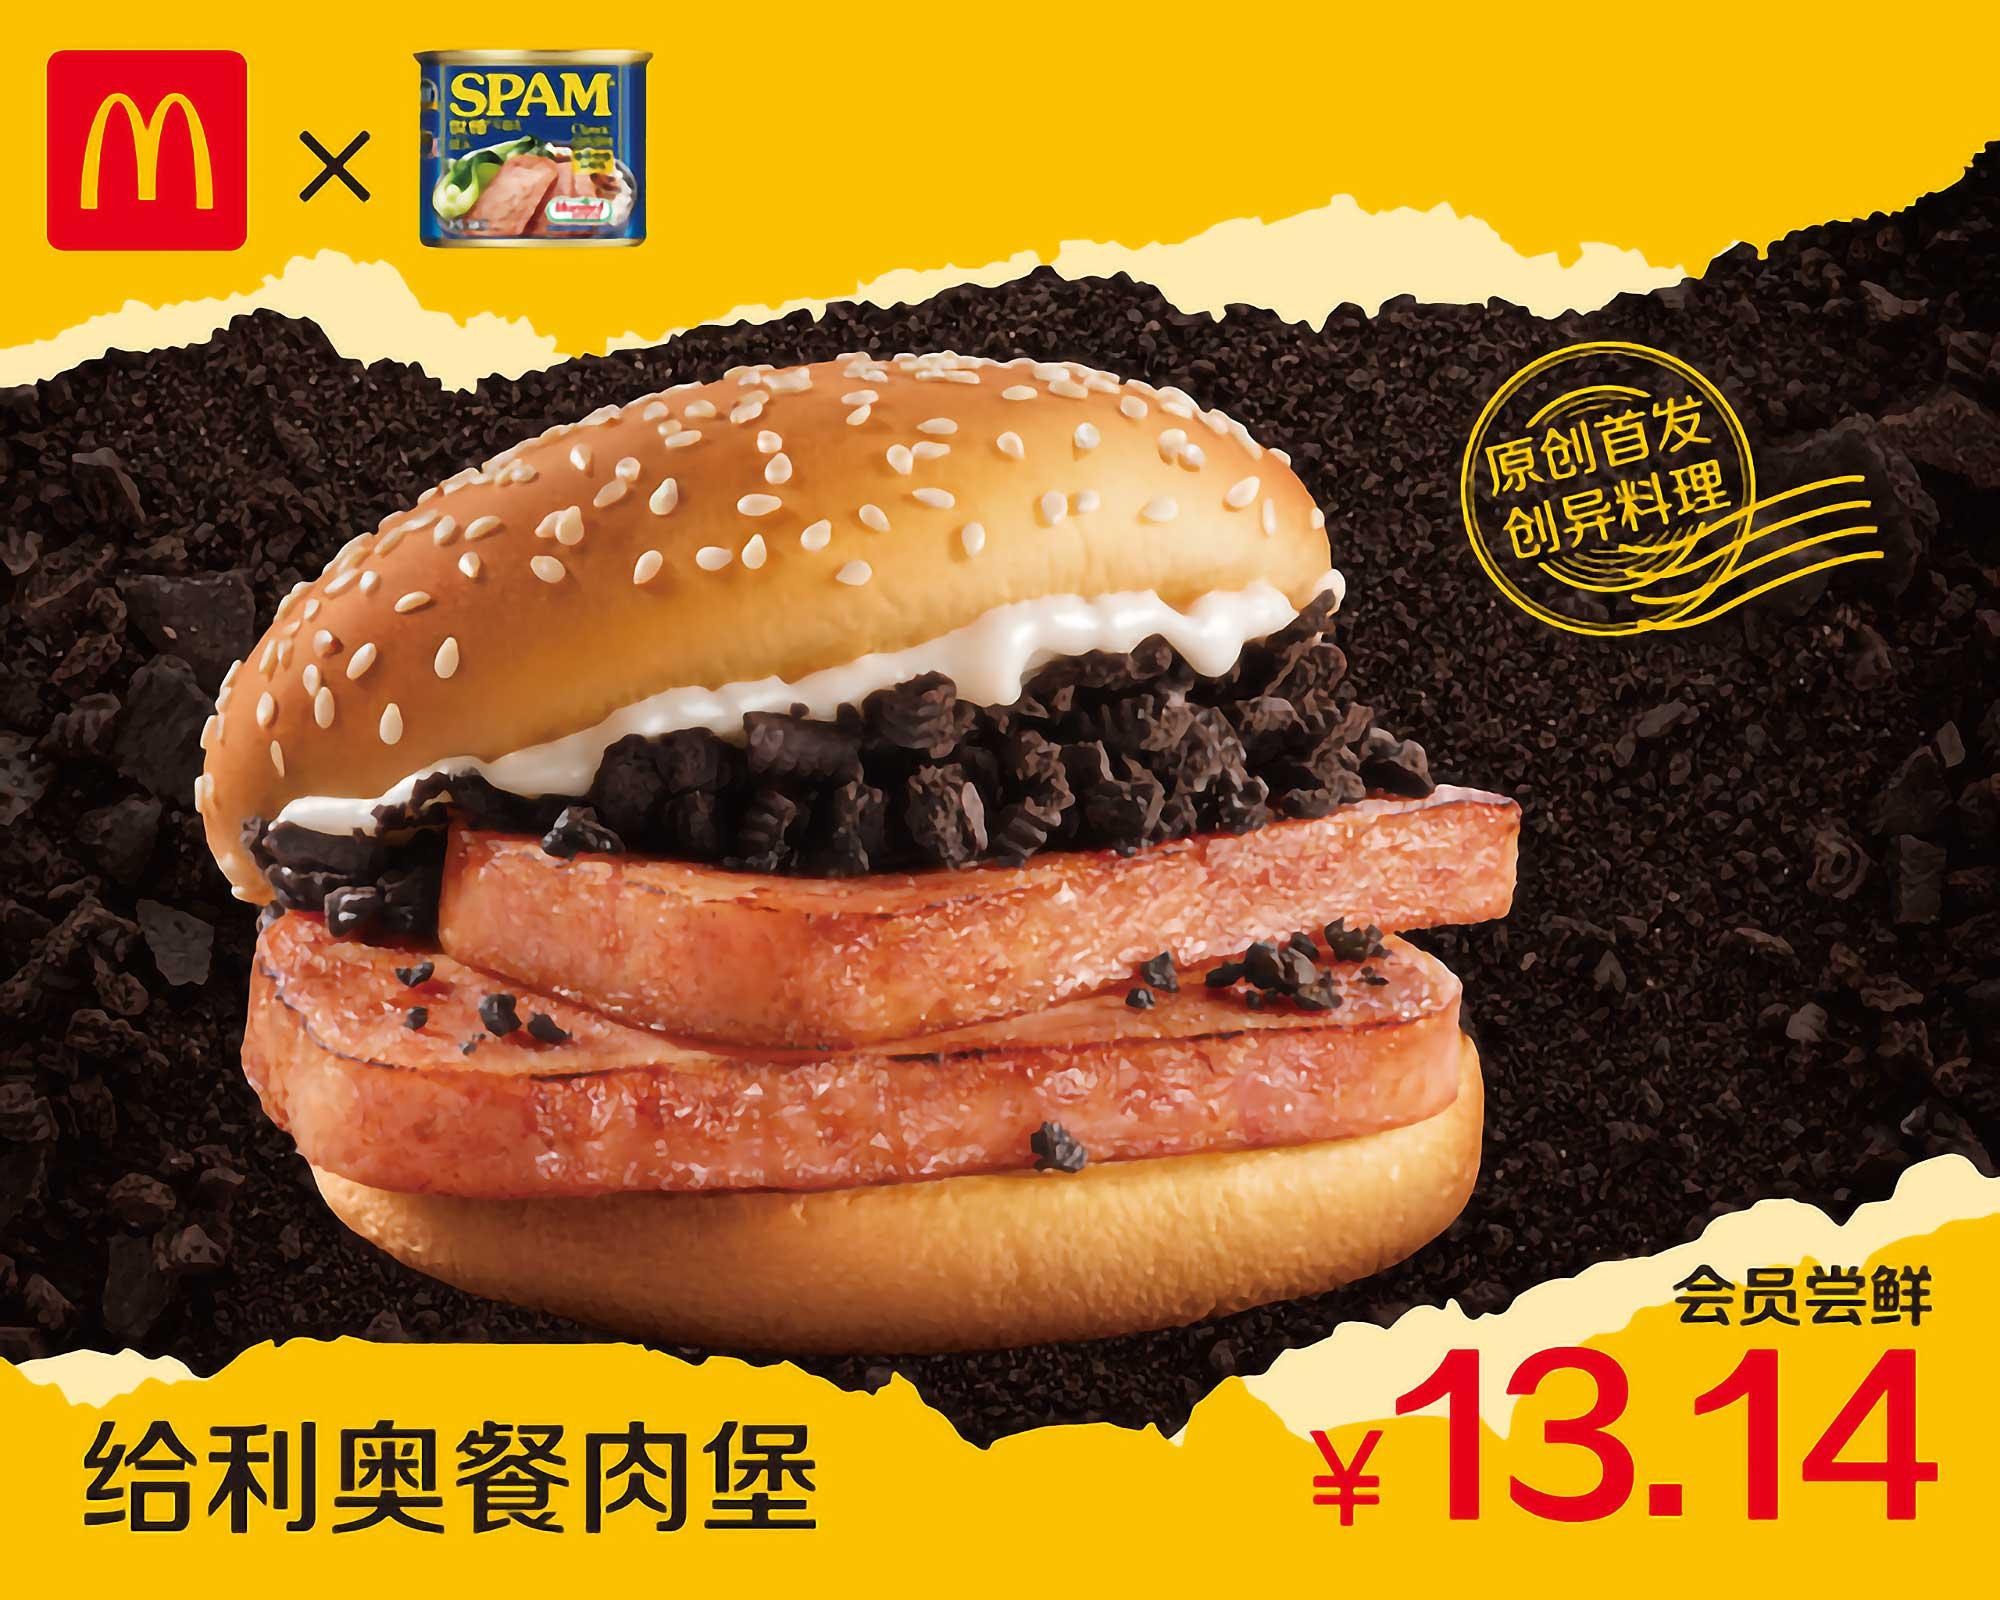 McDonald's China x SPAM & Oreo Burger